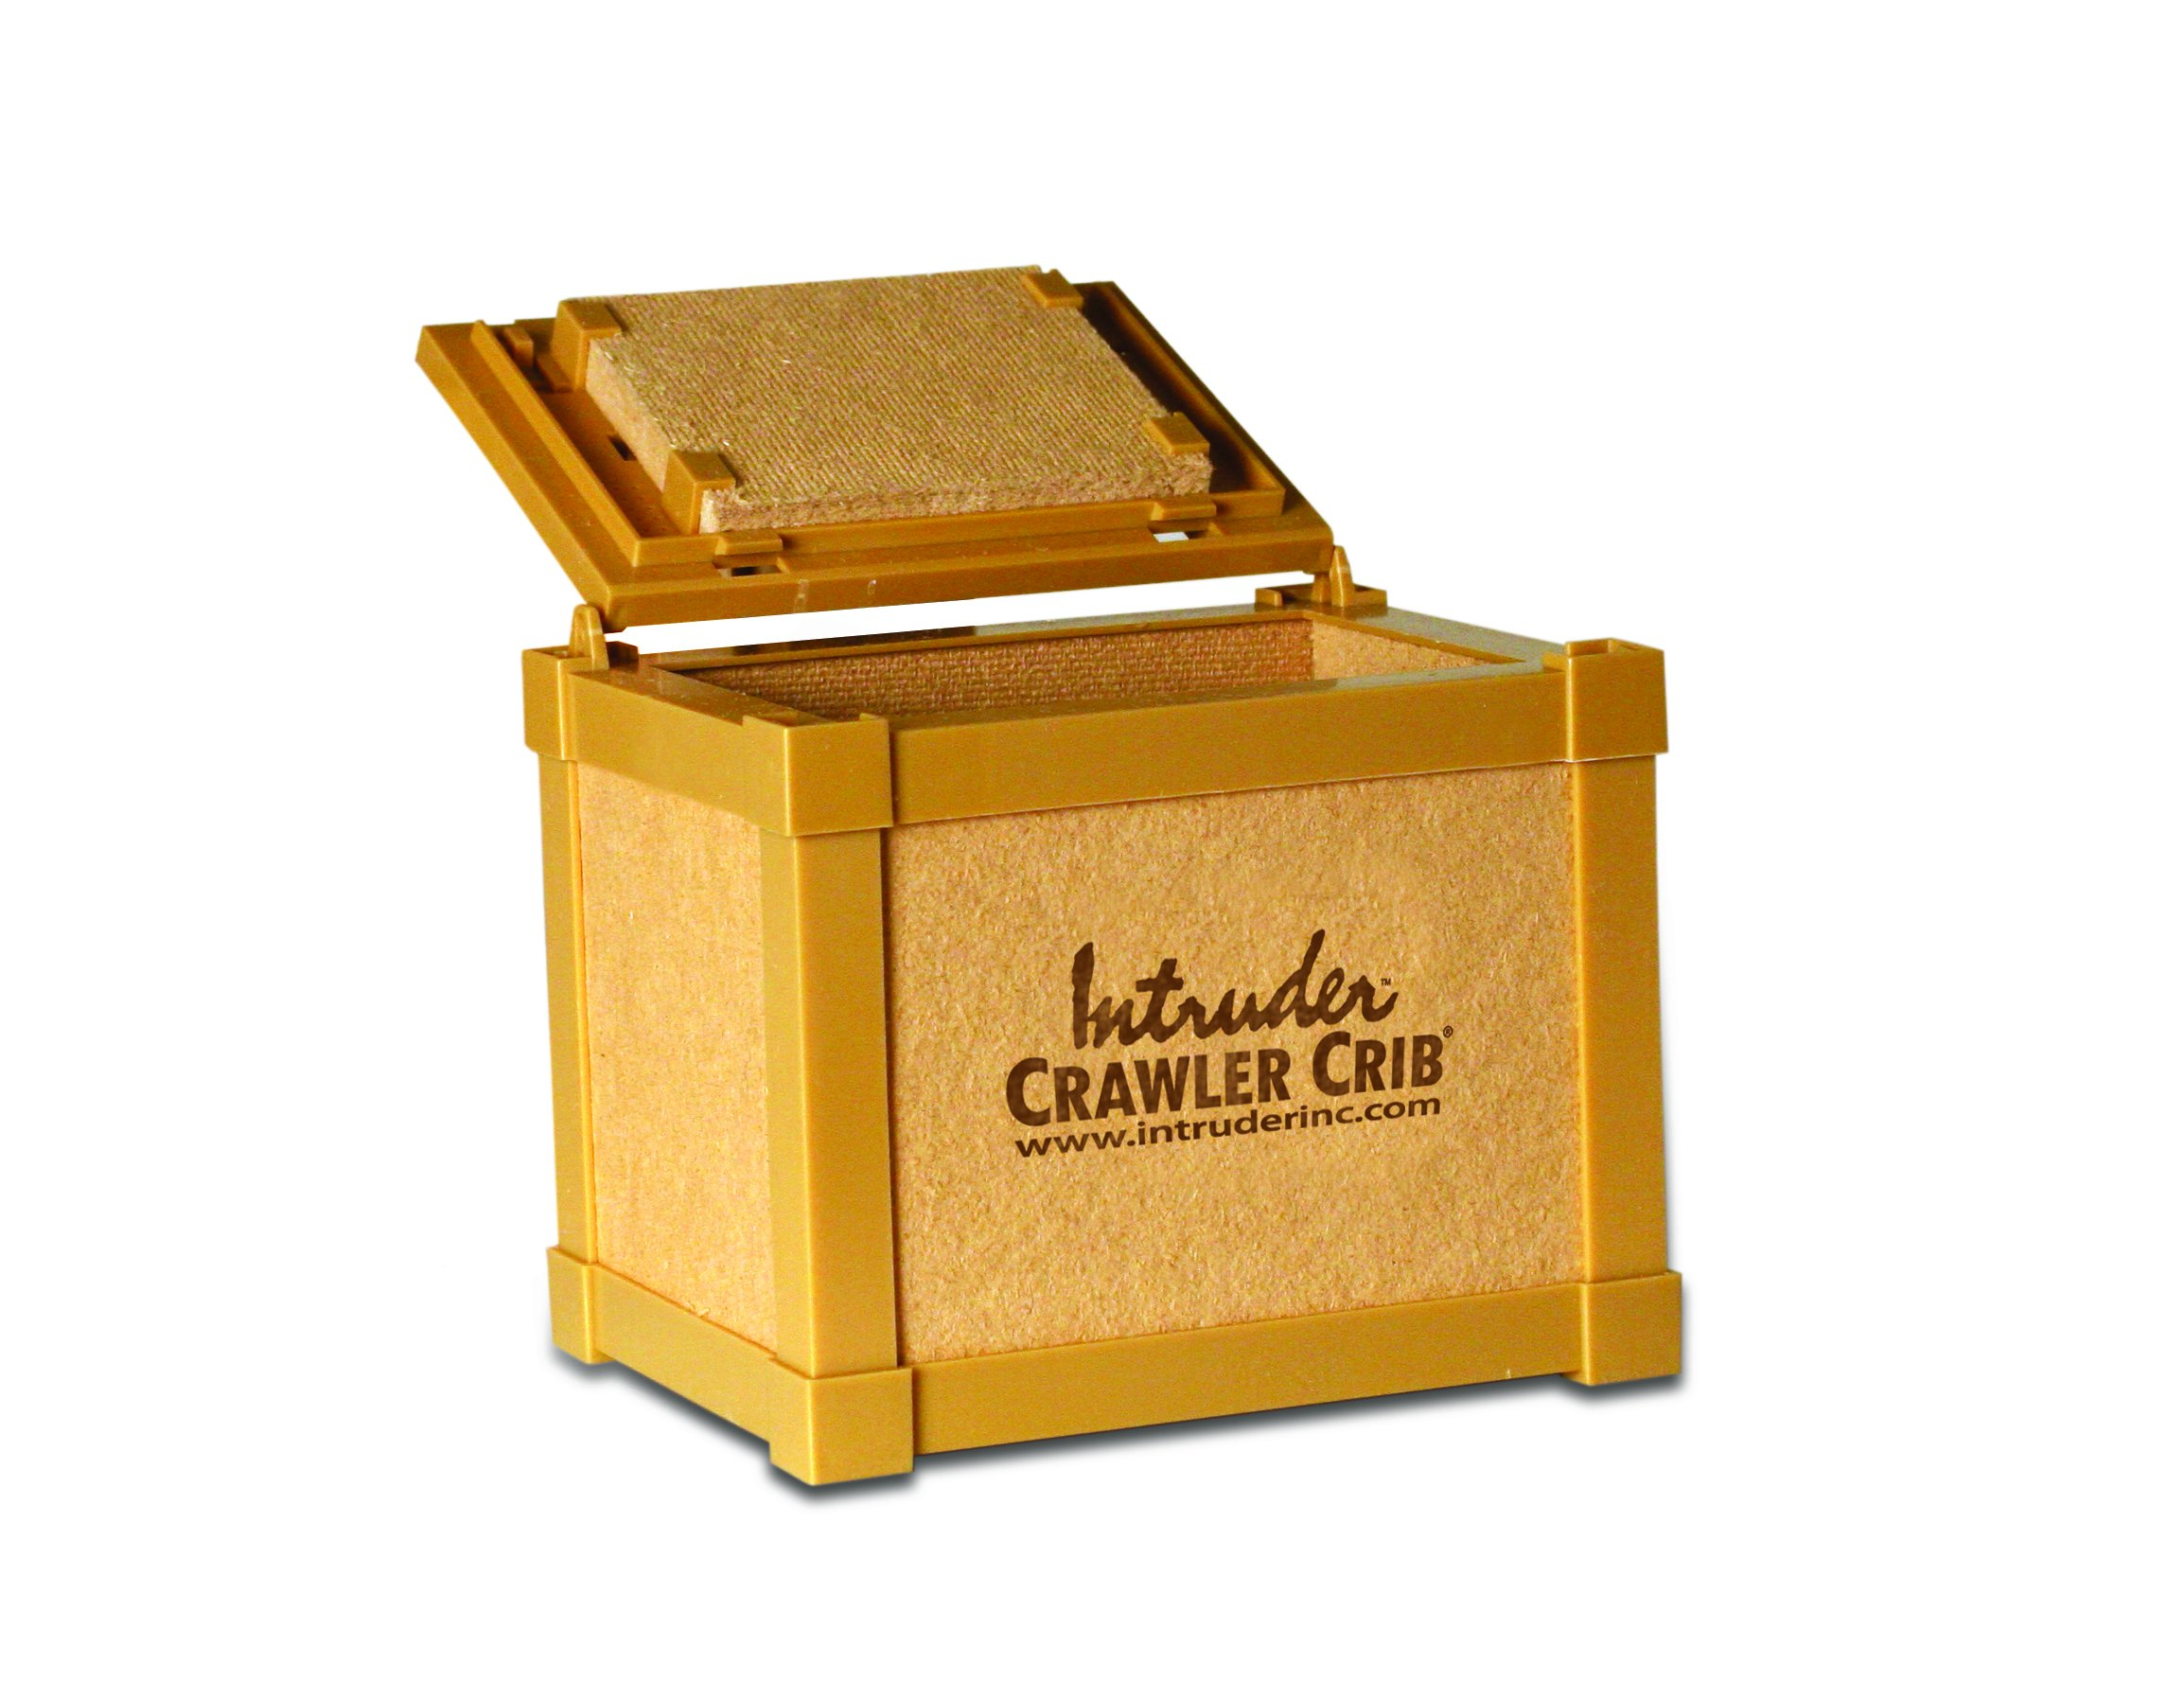 Intruder NightCrawler Worm Bait Box, Keeps Bait Fresh, Packed with Good N' Lively Worm Bedding, 8-inch x 6-inch x 7-inch by Intruder